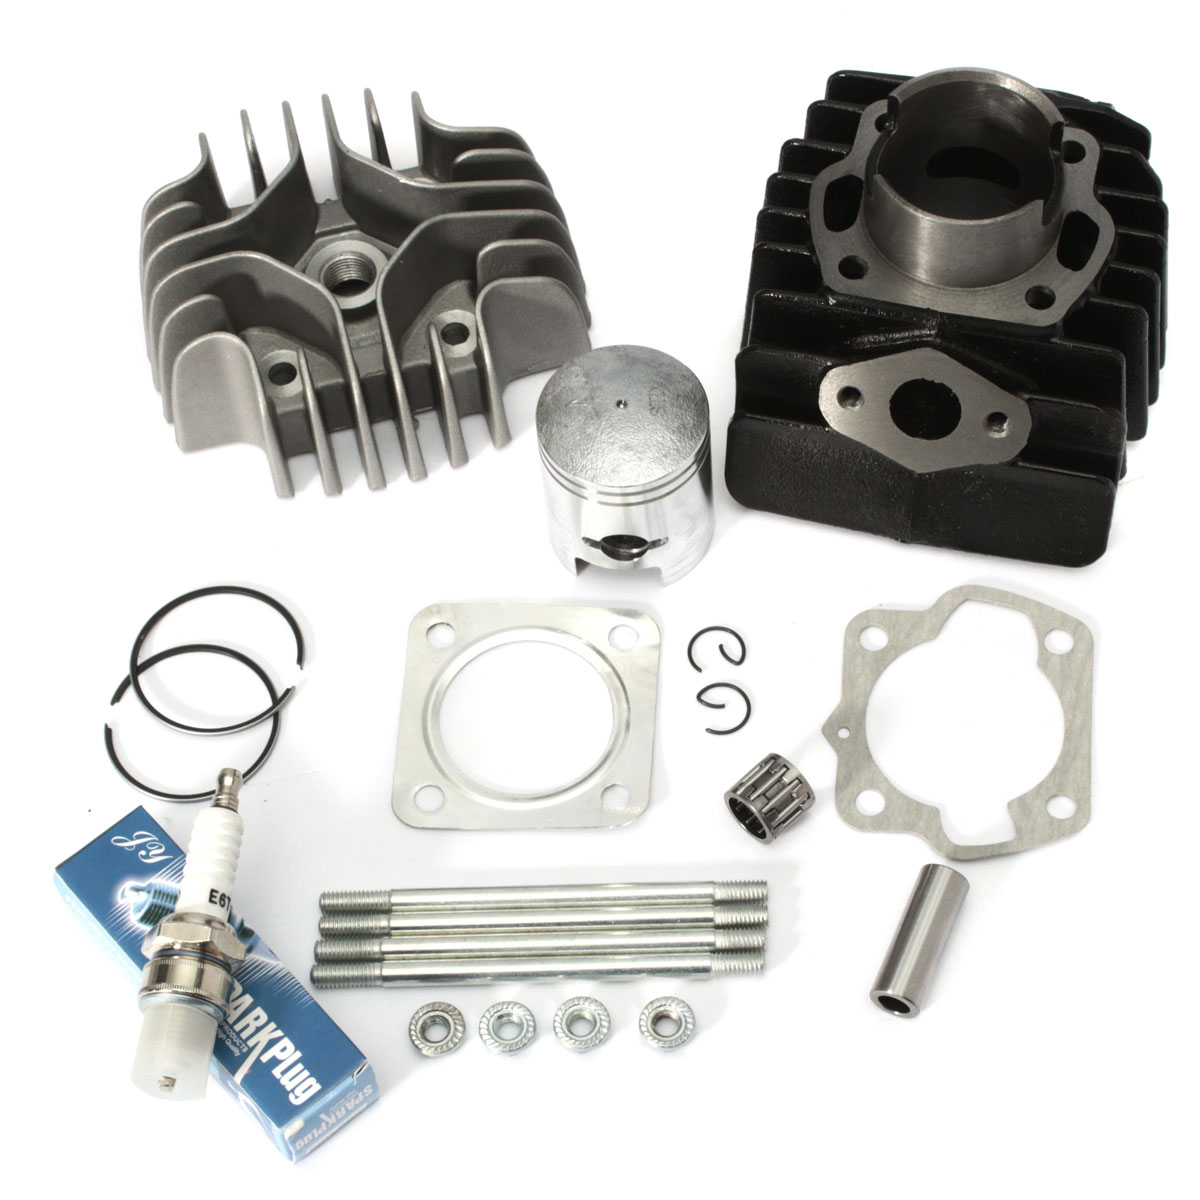 Cylinder Piston Ring Gasket Top End Kit For Suzuki Quadrunner LT50 1984-1987 11210-04012-0F0 11111-04001 12110-43000